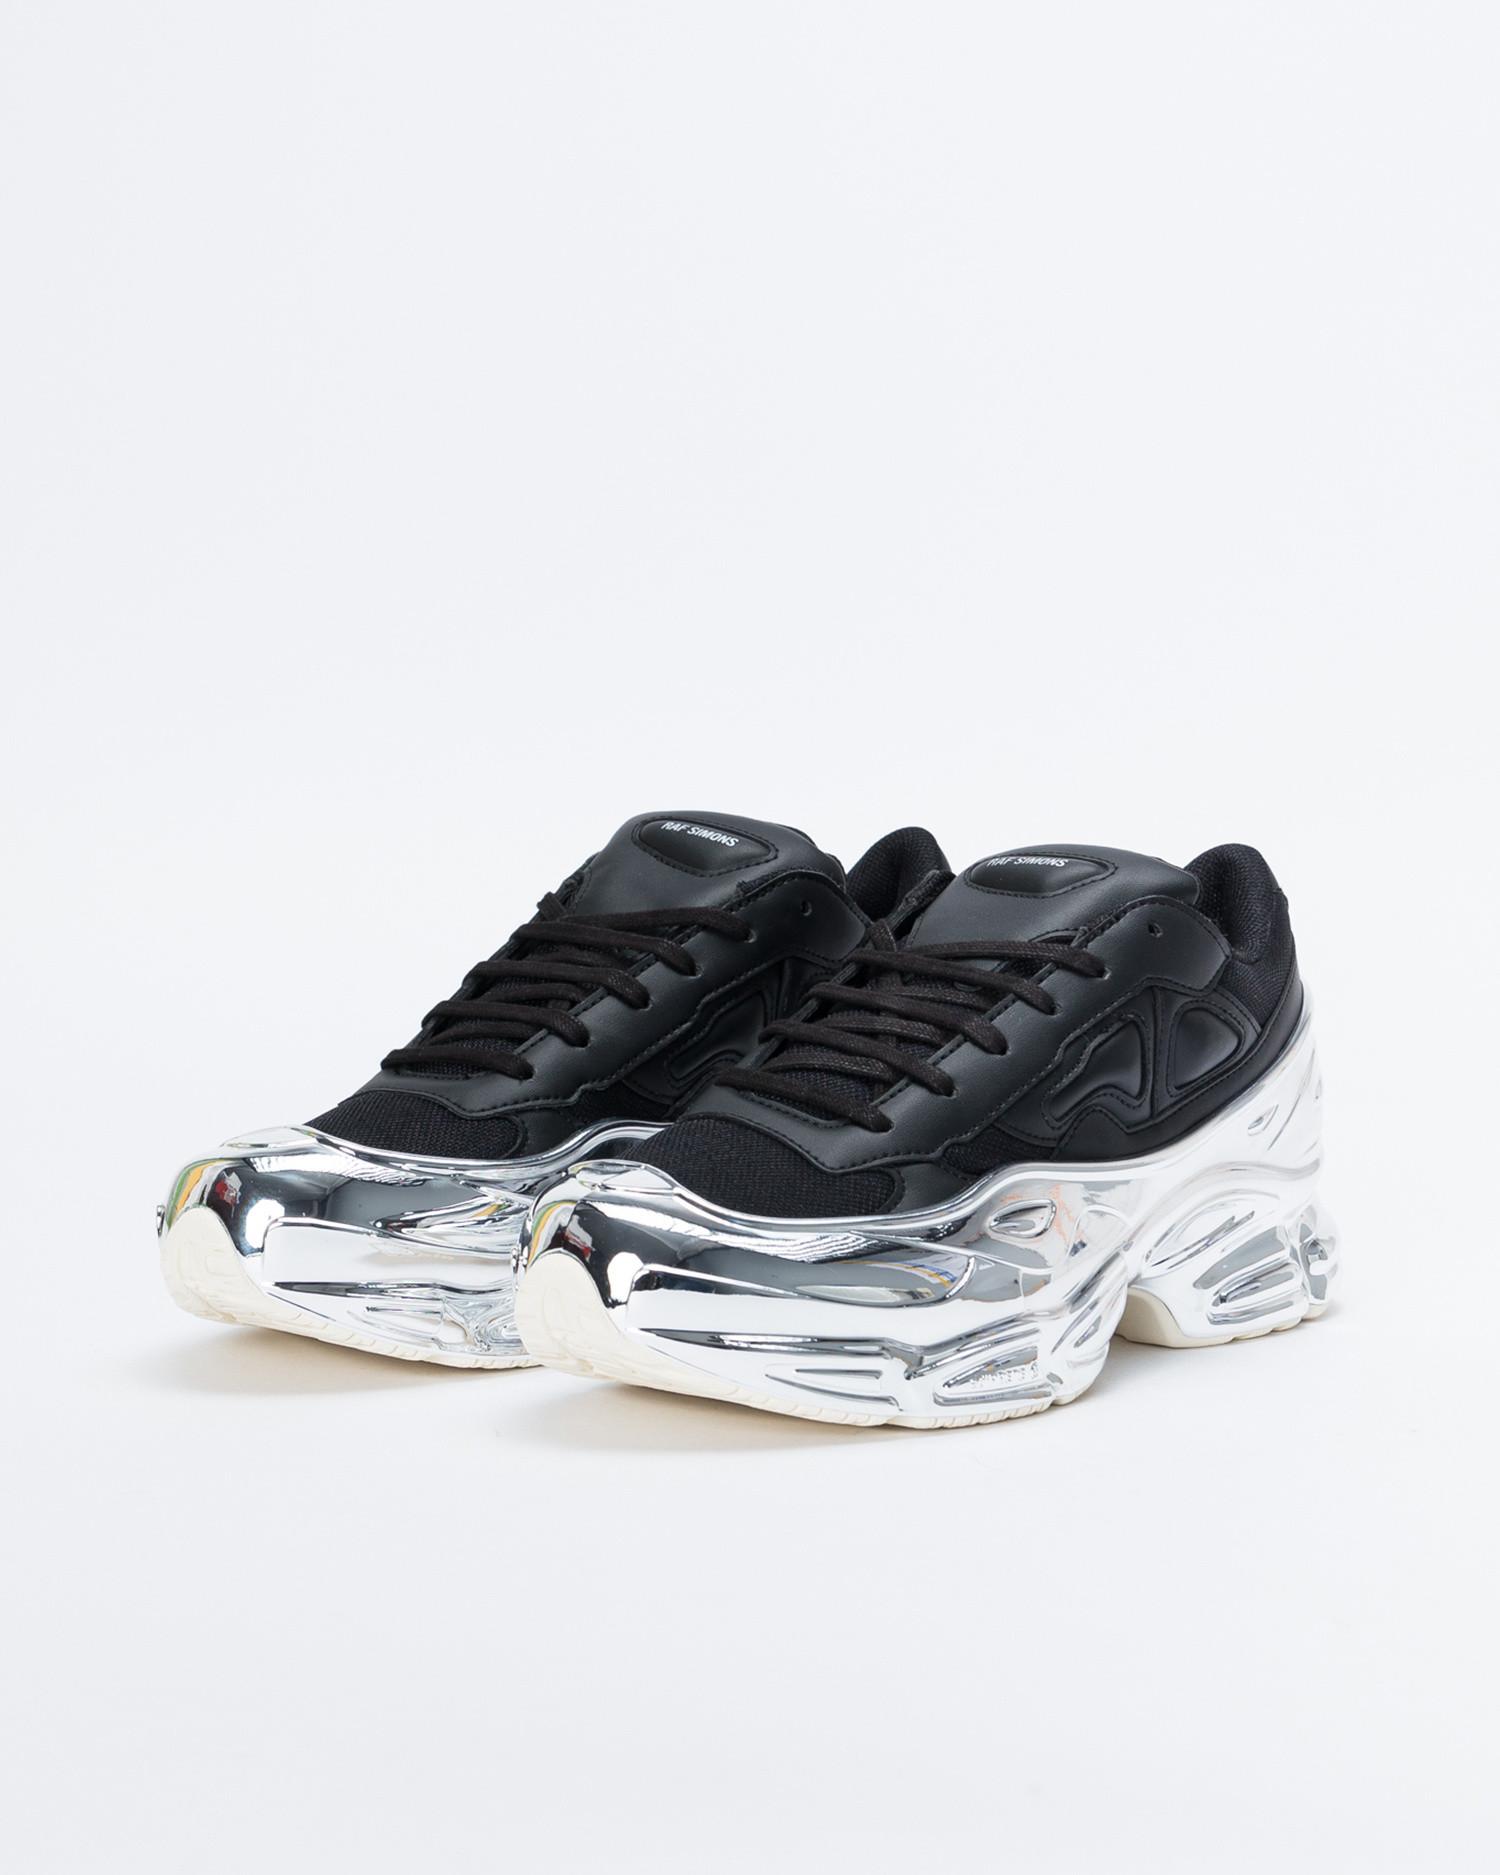 Adidas Raf Simons Ozweego Cblack/Silvmt/Silvmt